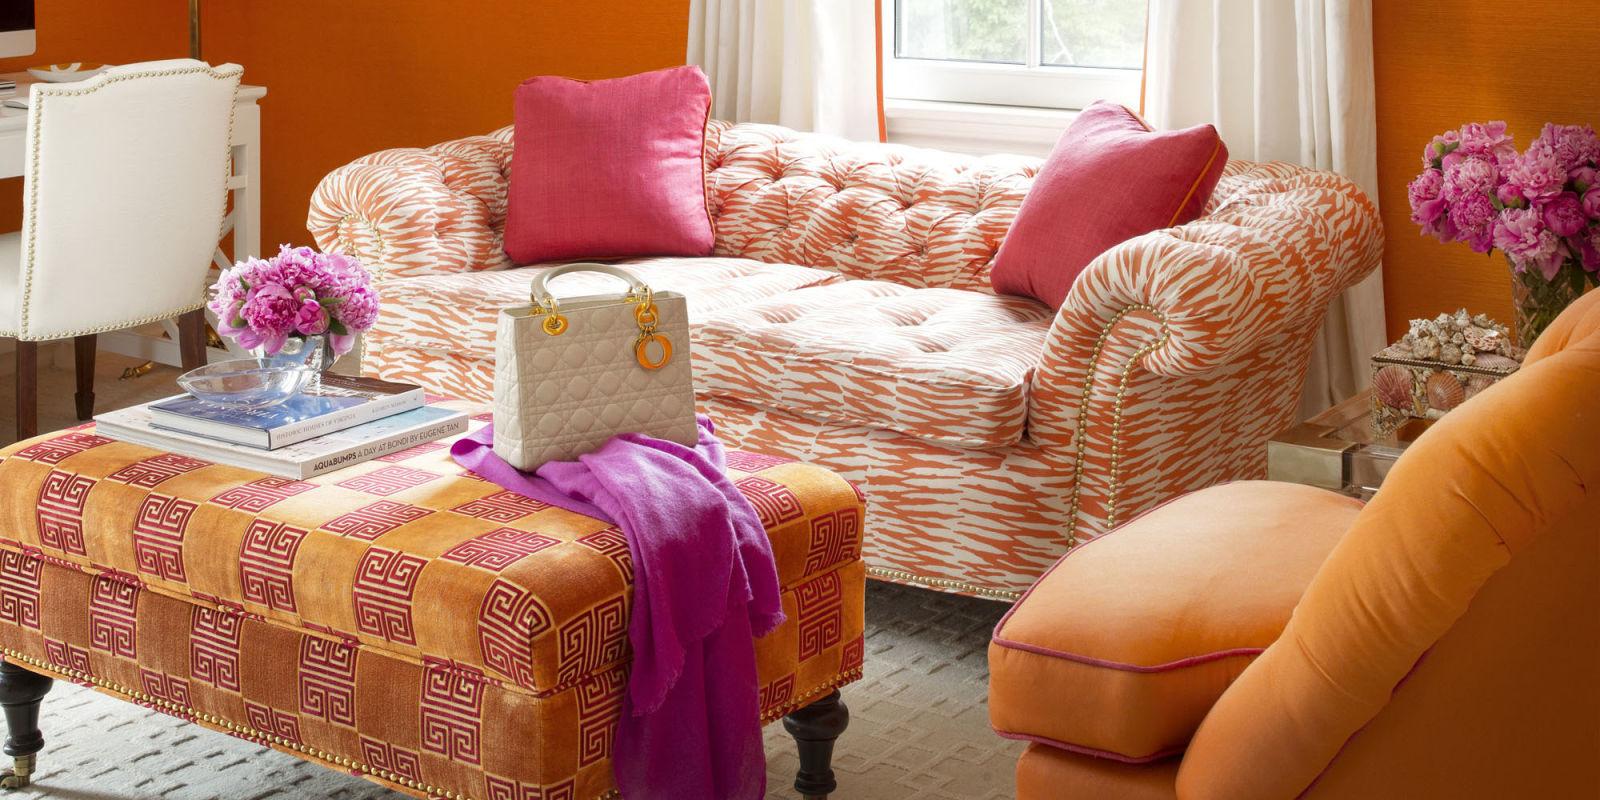 Joanna gaines and standard furniture elhouz